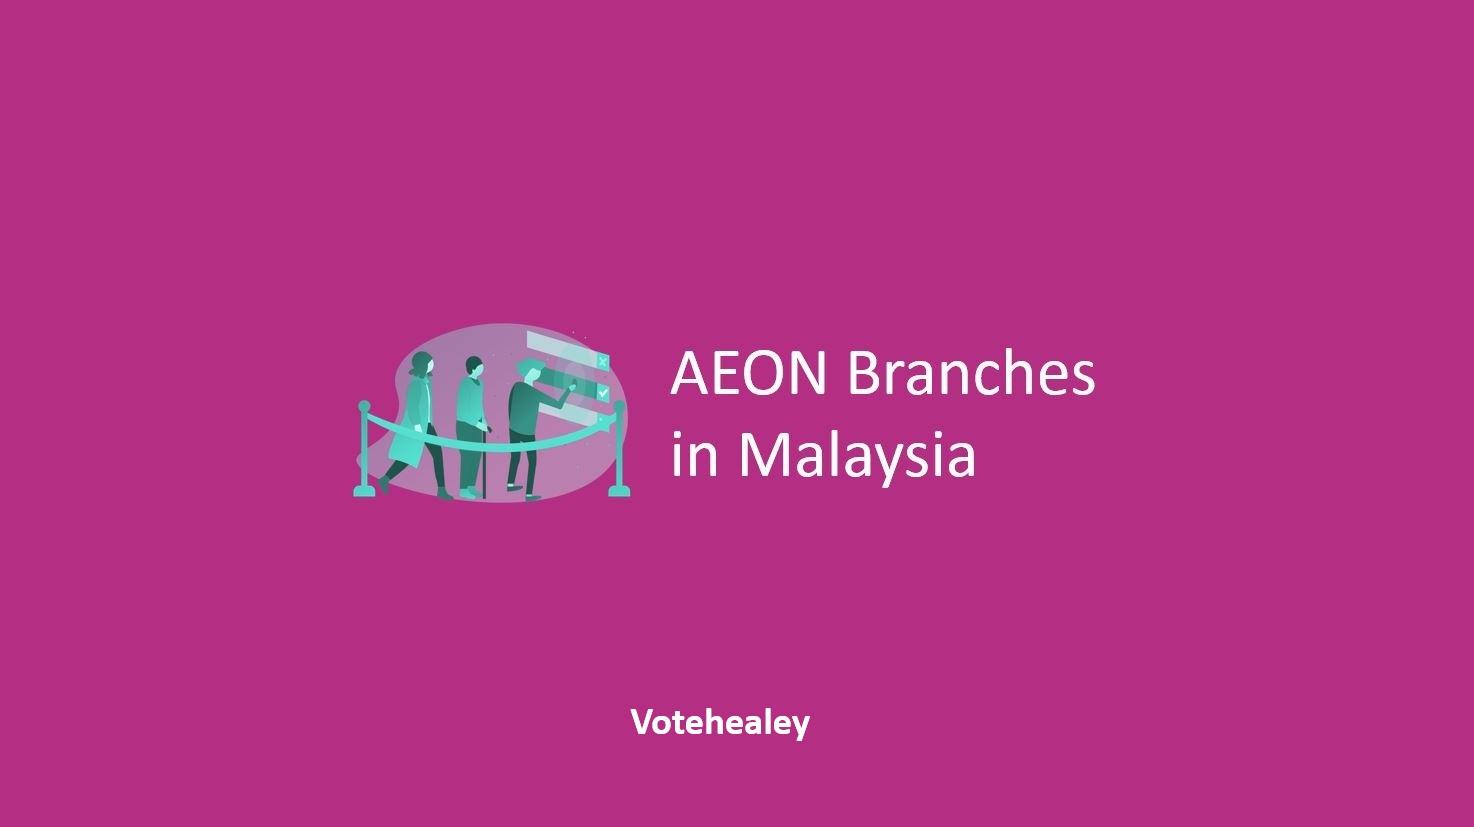 AEON Branches in Malaysia